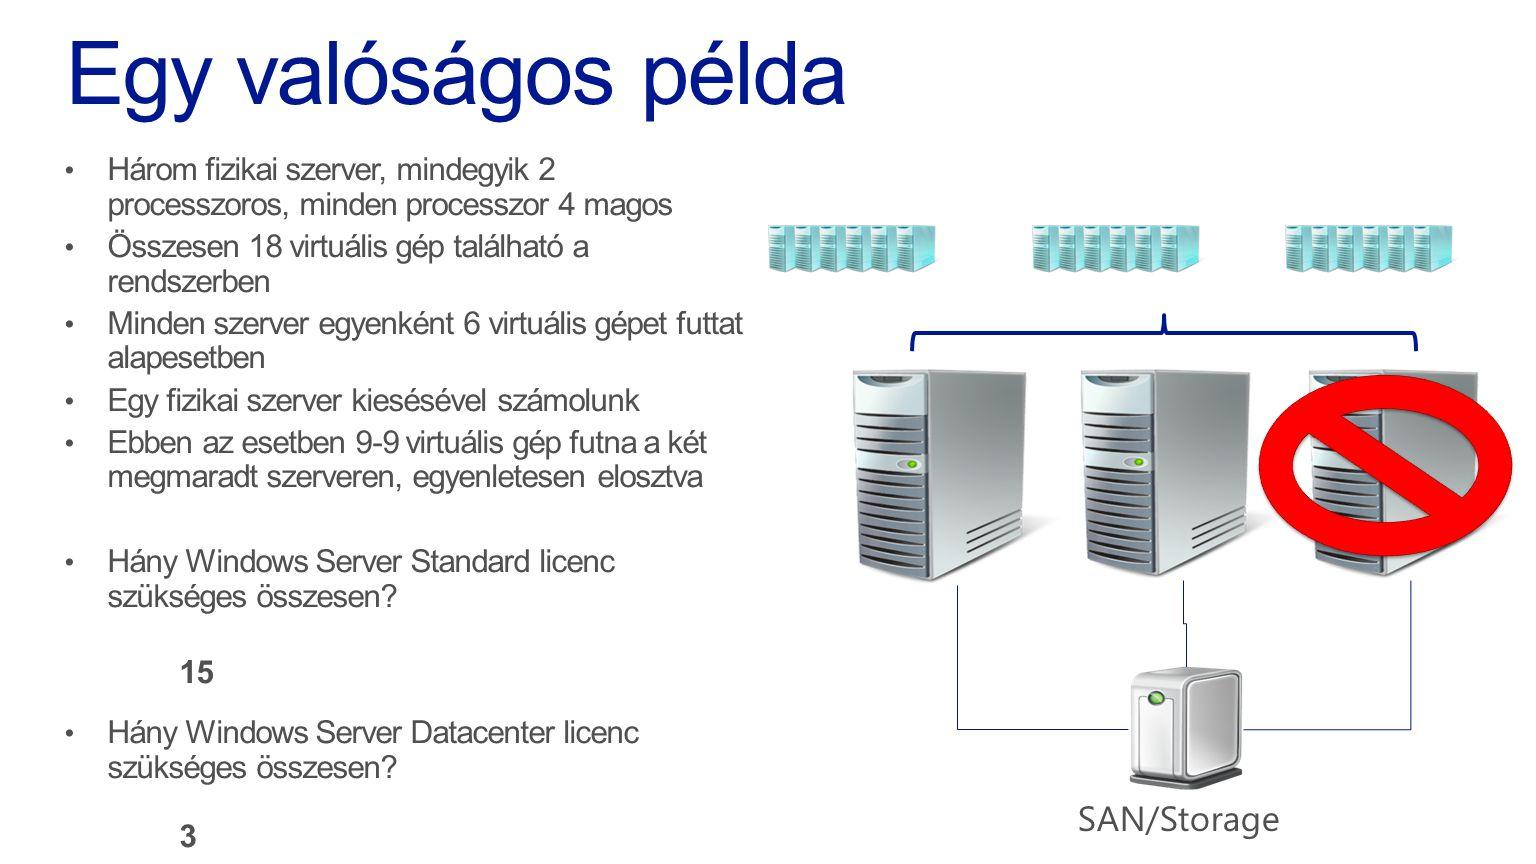 SAN/Storage